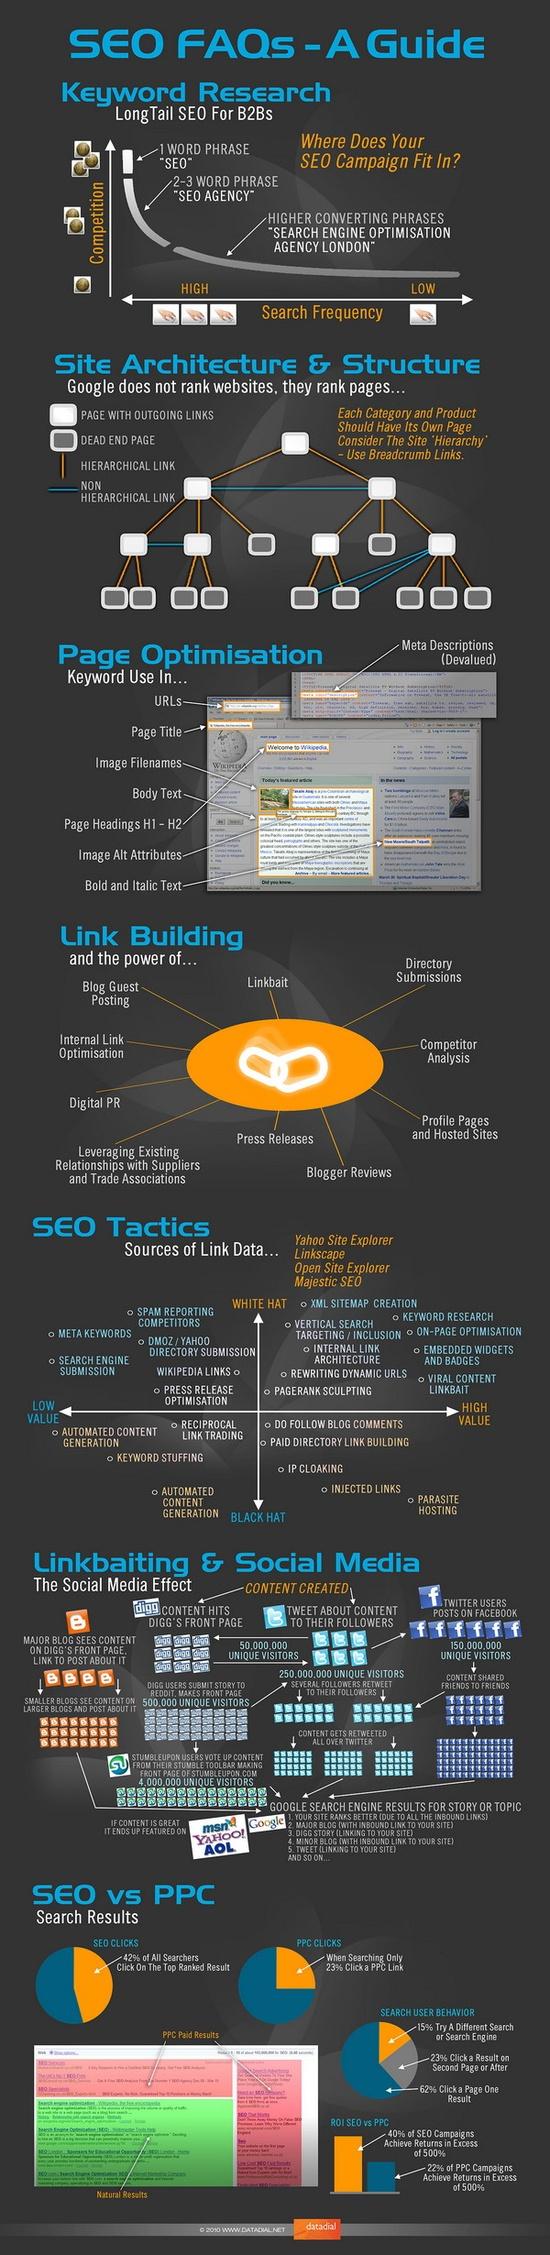 seo faq guide infographic